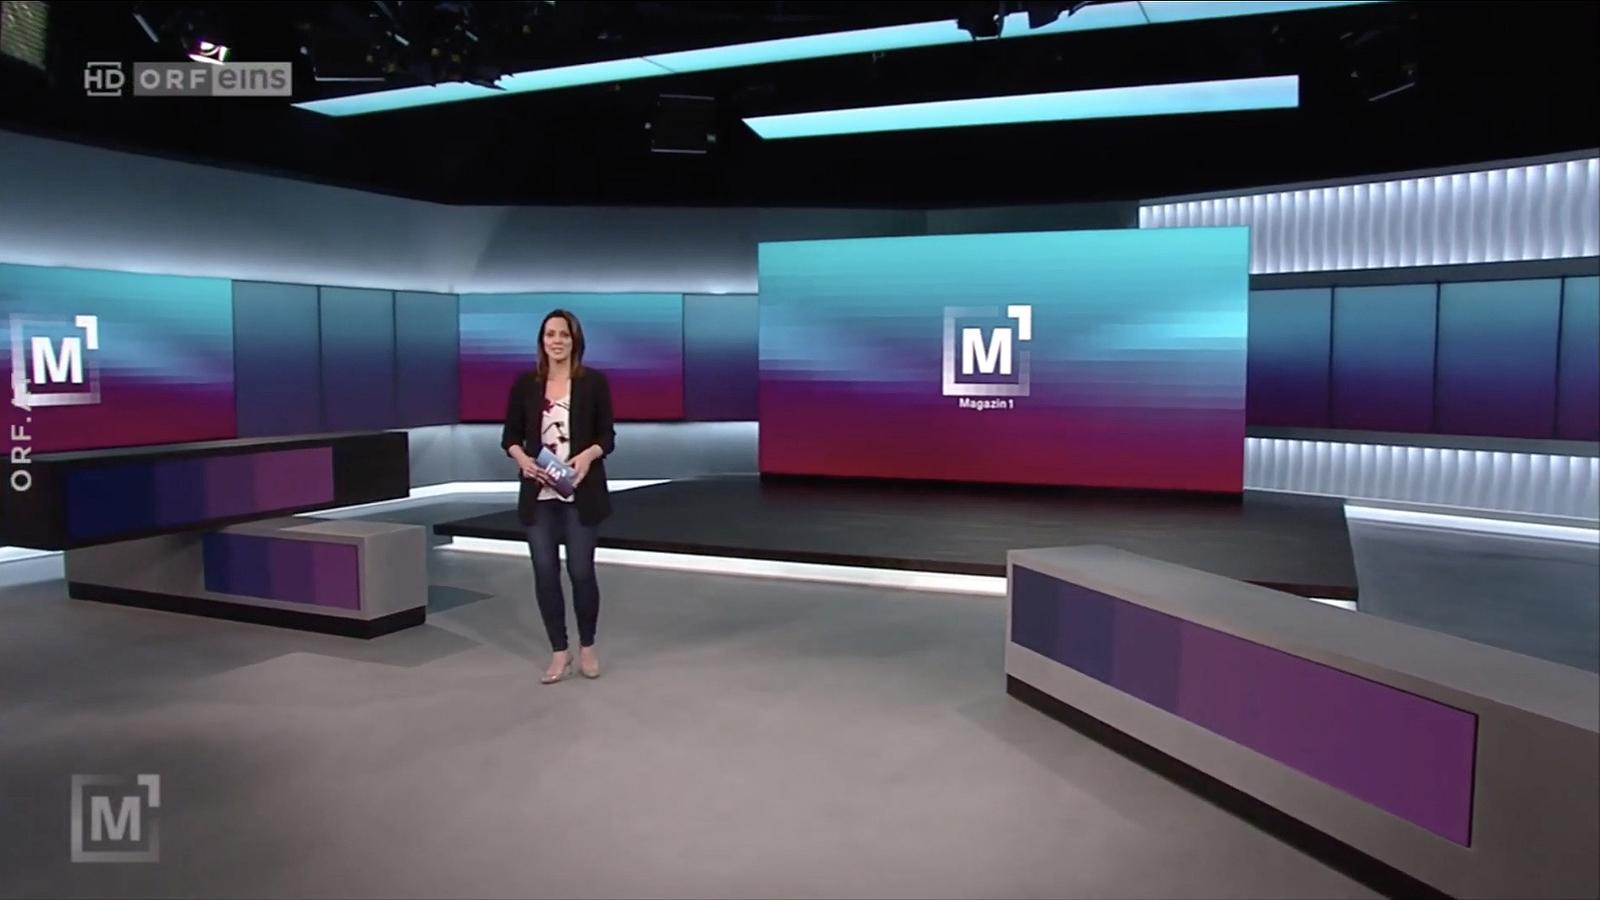 NCS_ORF-Veech-2019_0009